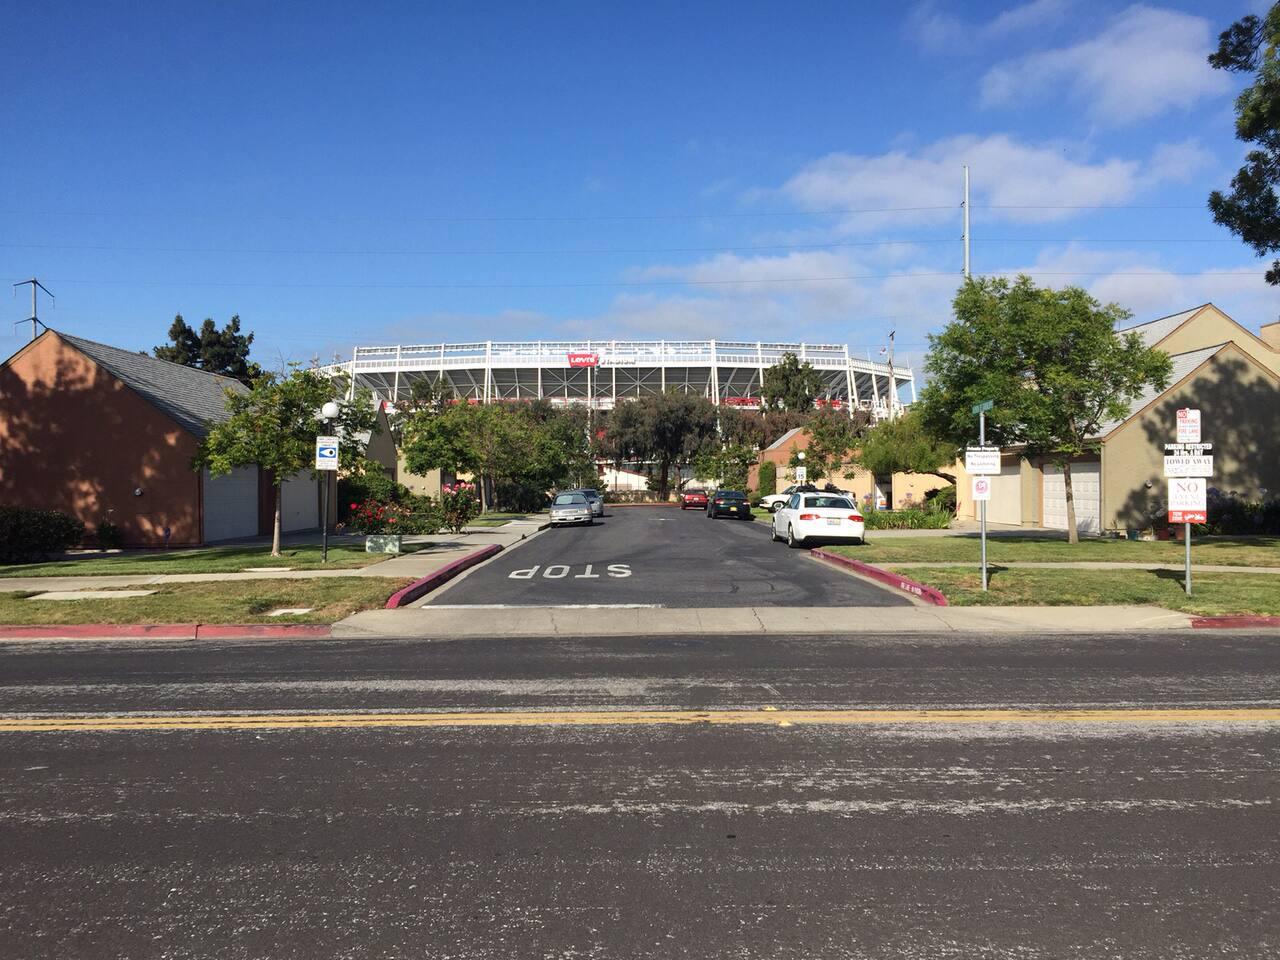 Short walk to Levi's Stadium